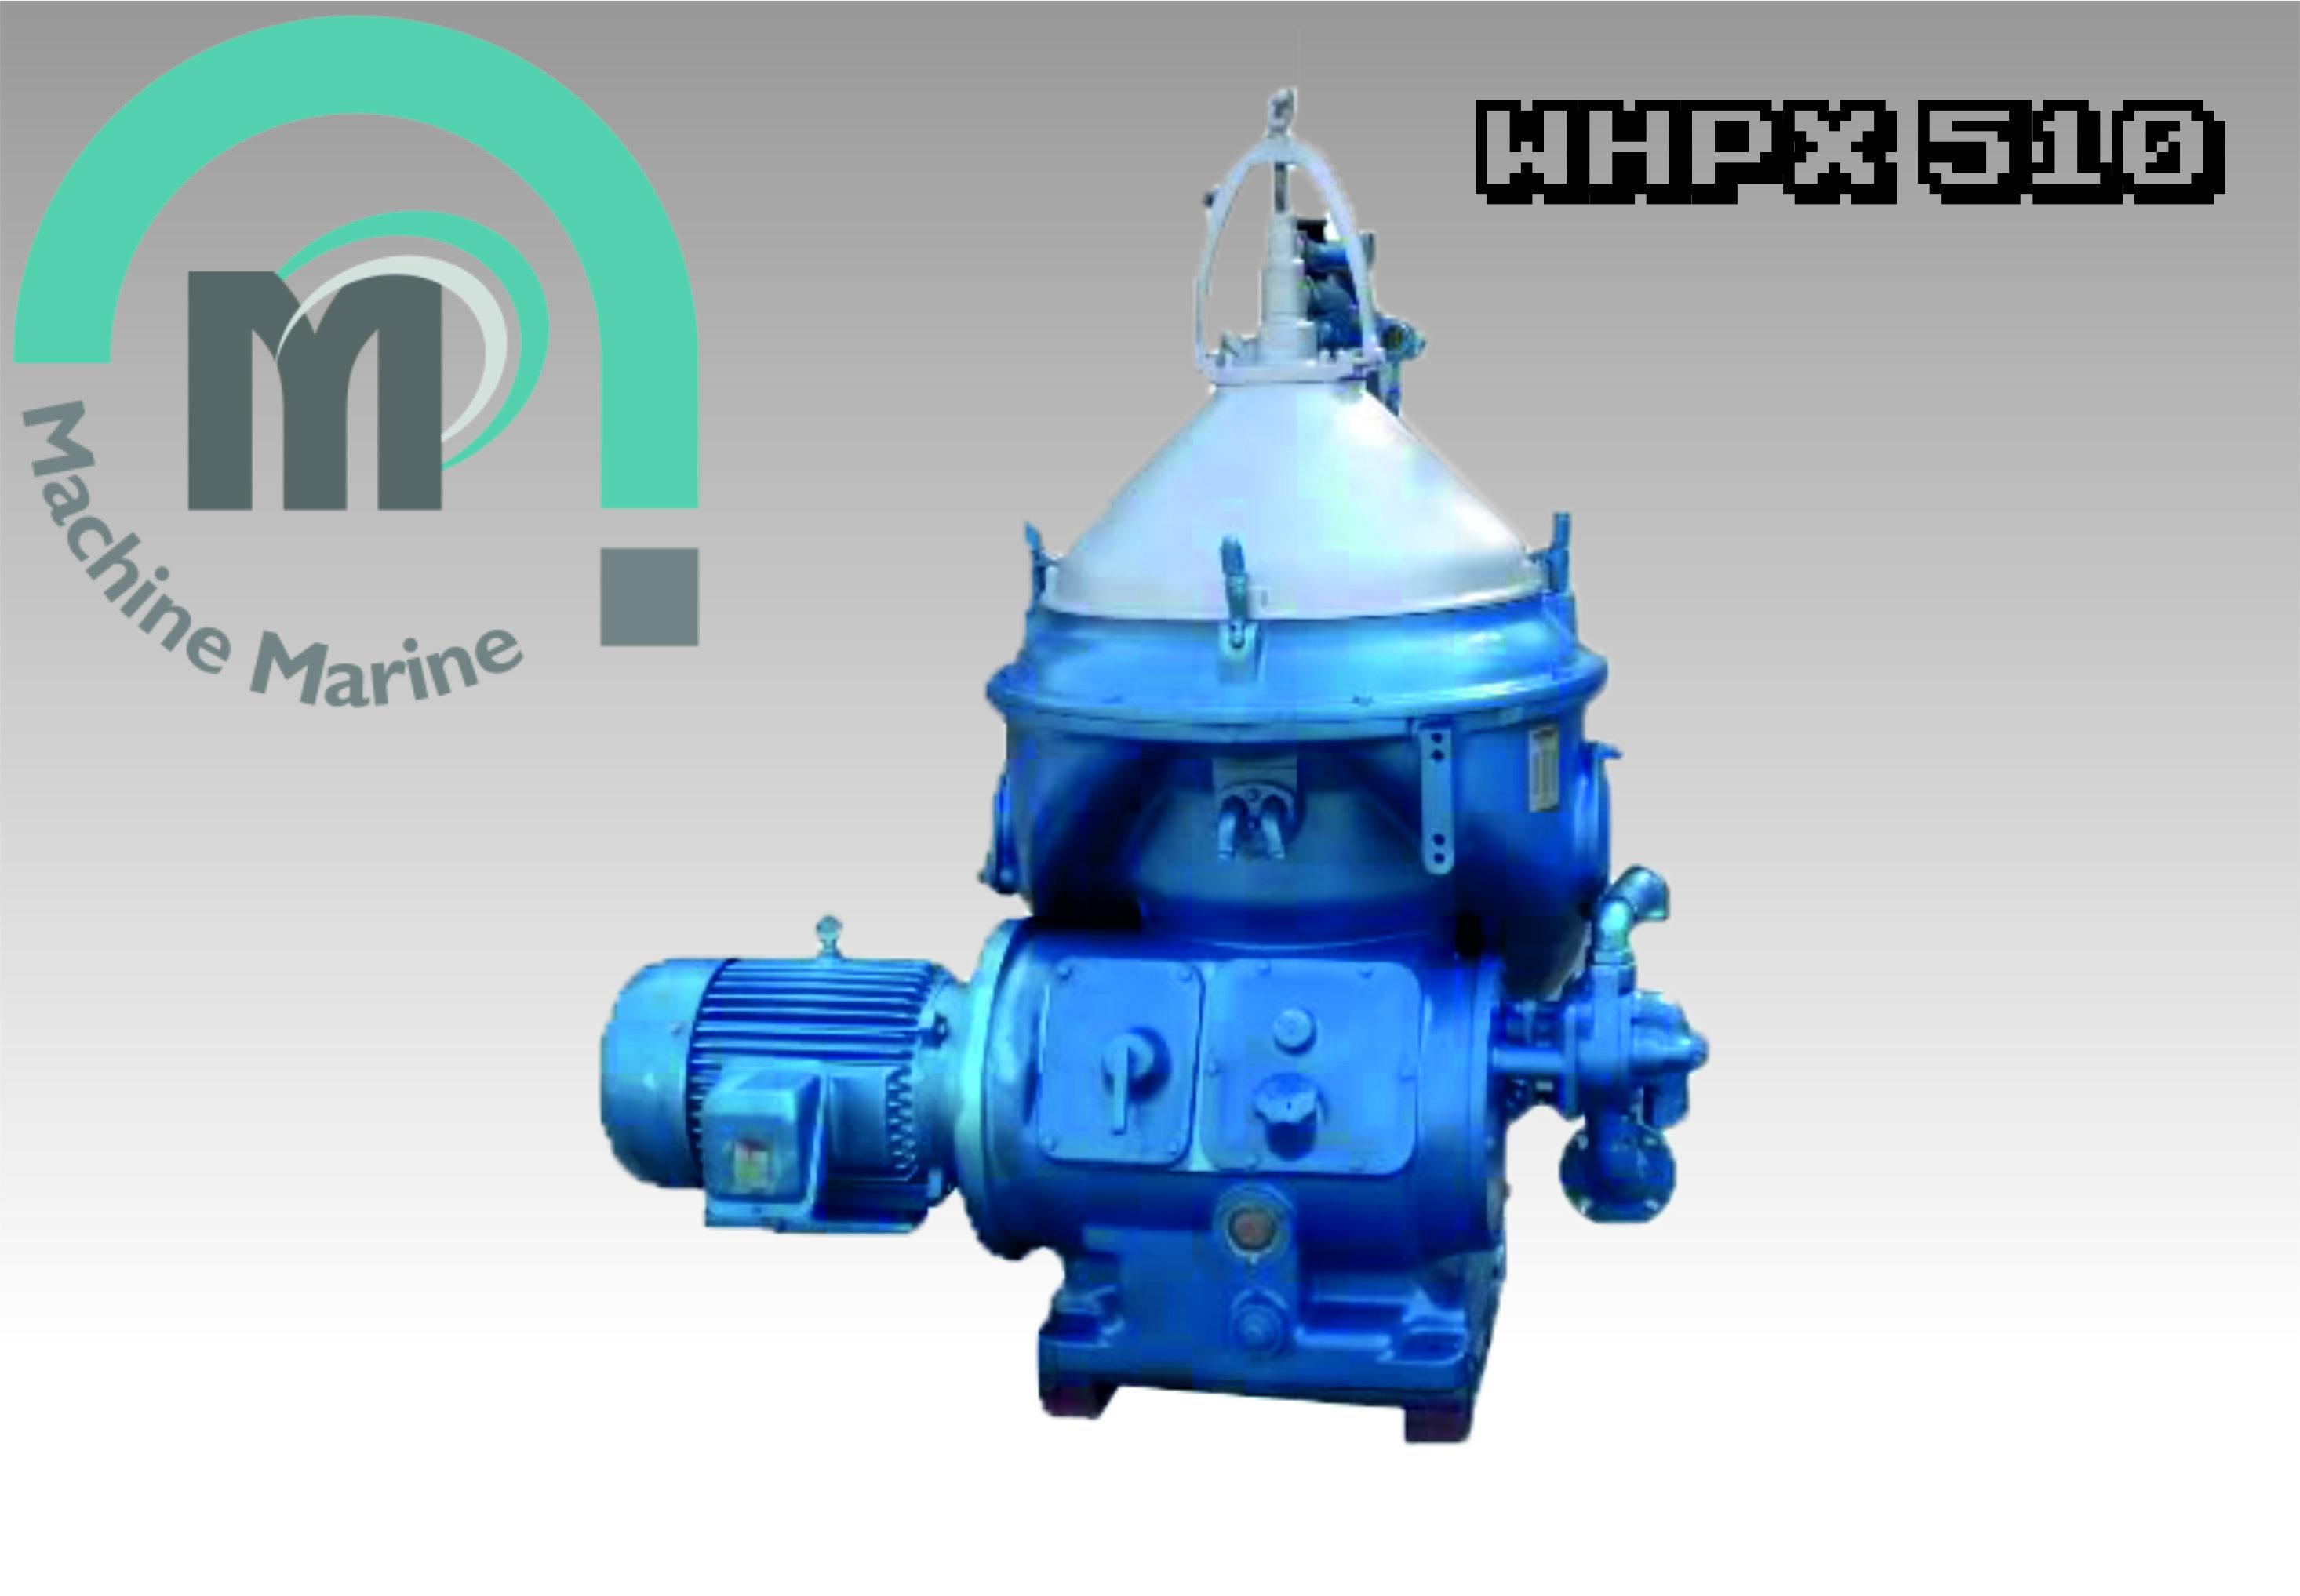 alfa laval whpx 510 oil purifier alfa laval centrifuge rh machinemarinecentrifuge com Alfa Laval Butterfly Valve Alfa Laval Separator